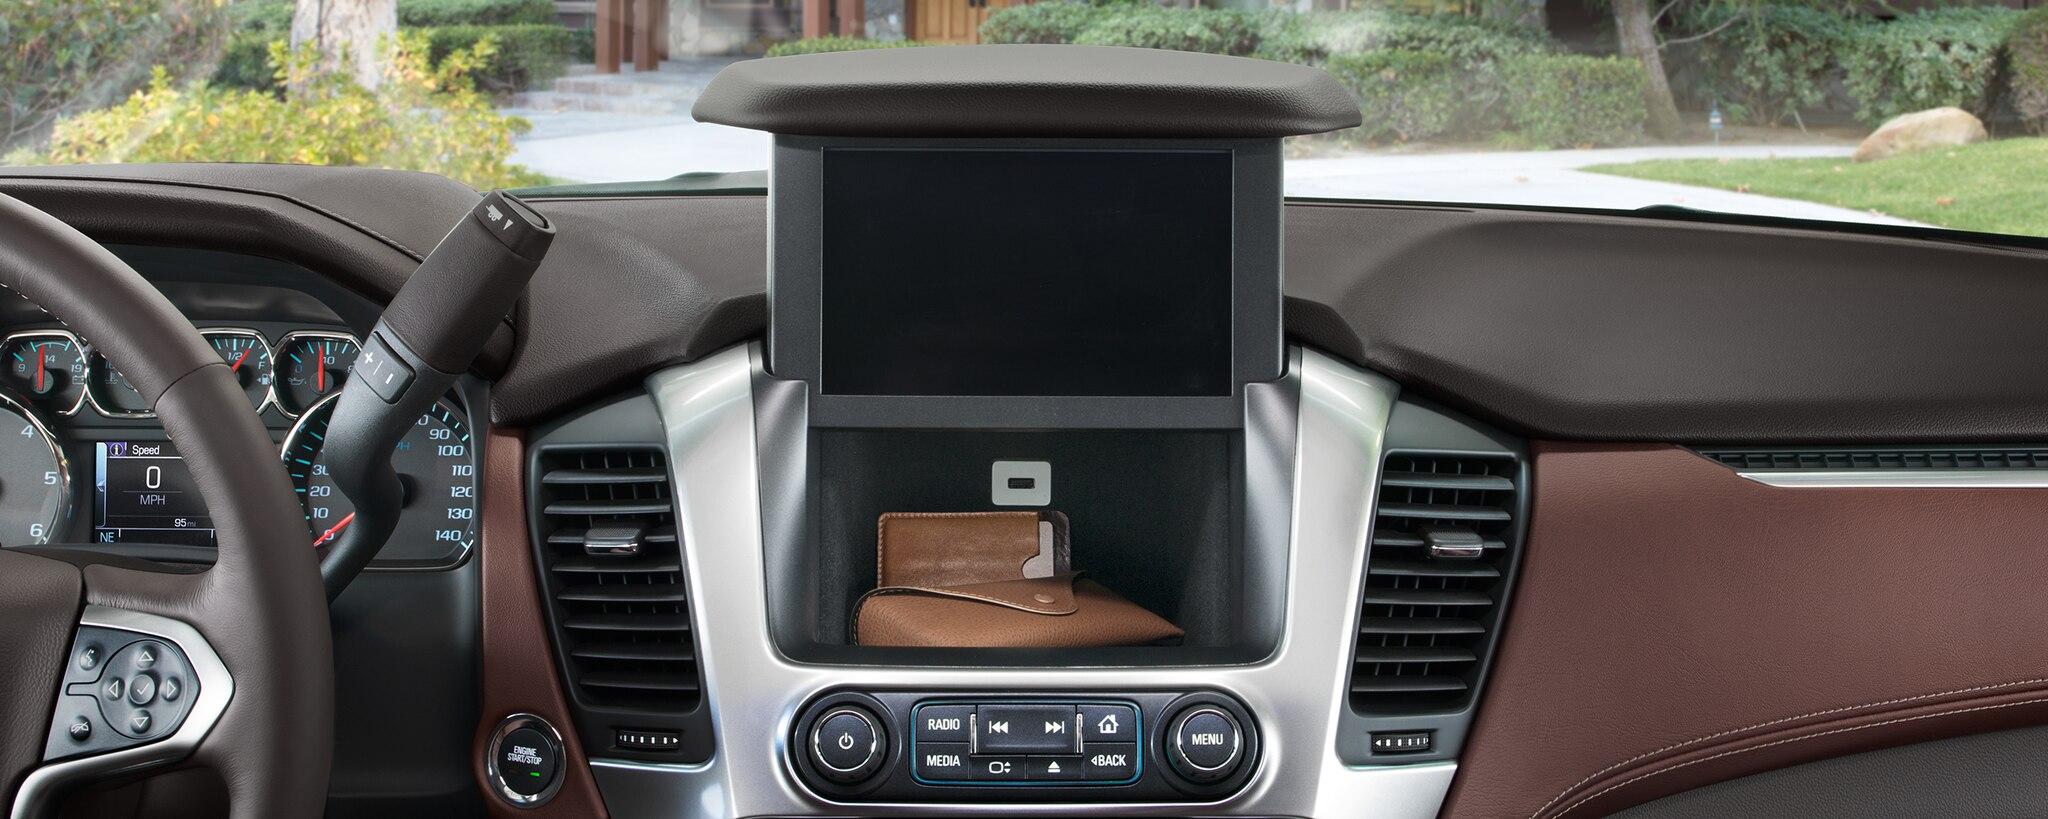 Gama de SUV Chevrolet: almacenaje oculto